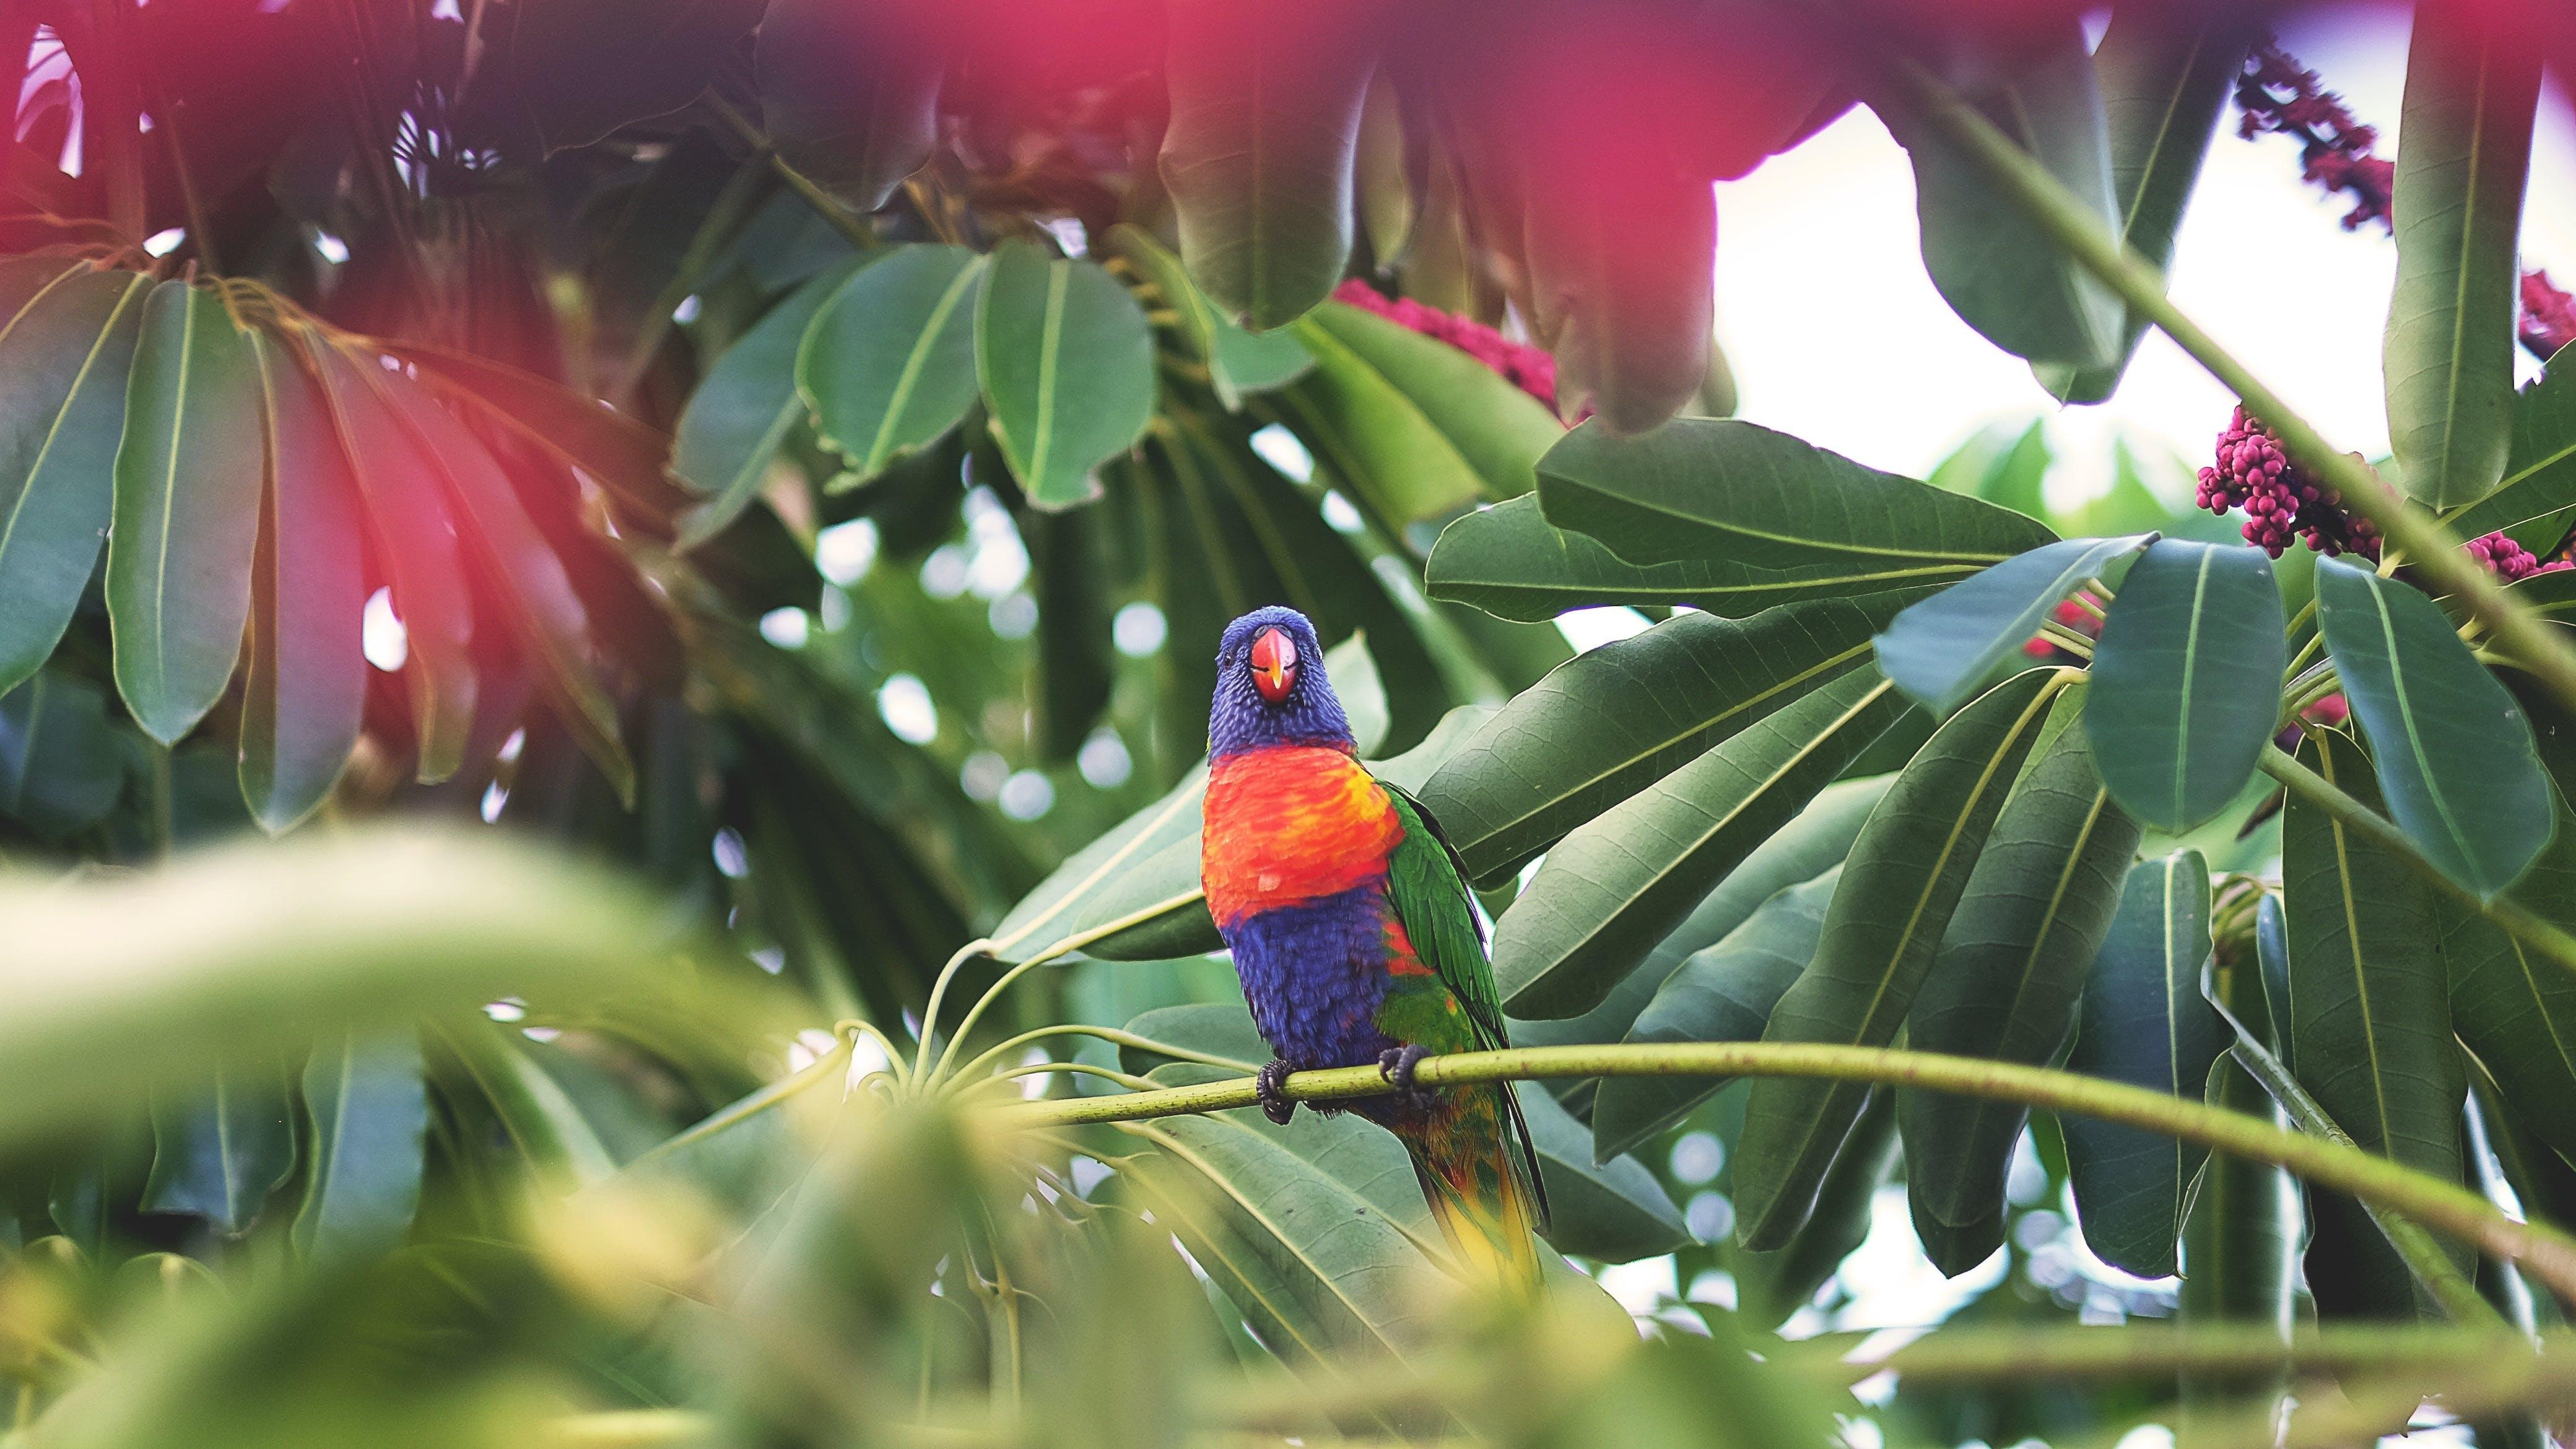 Free stock photo of animal, bird, colorful, exotic